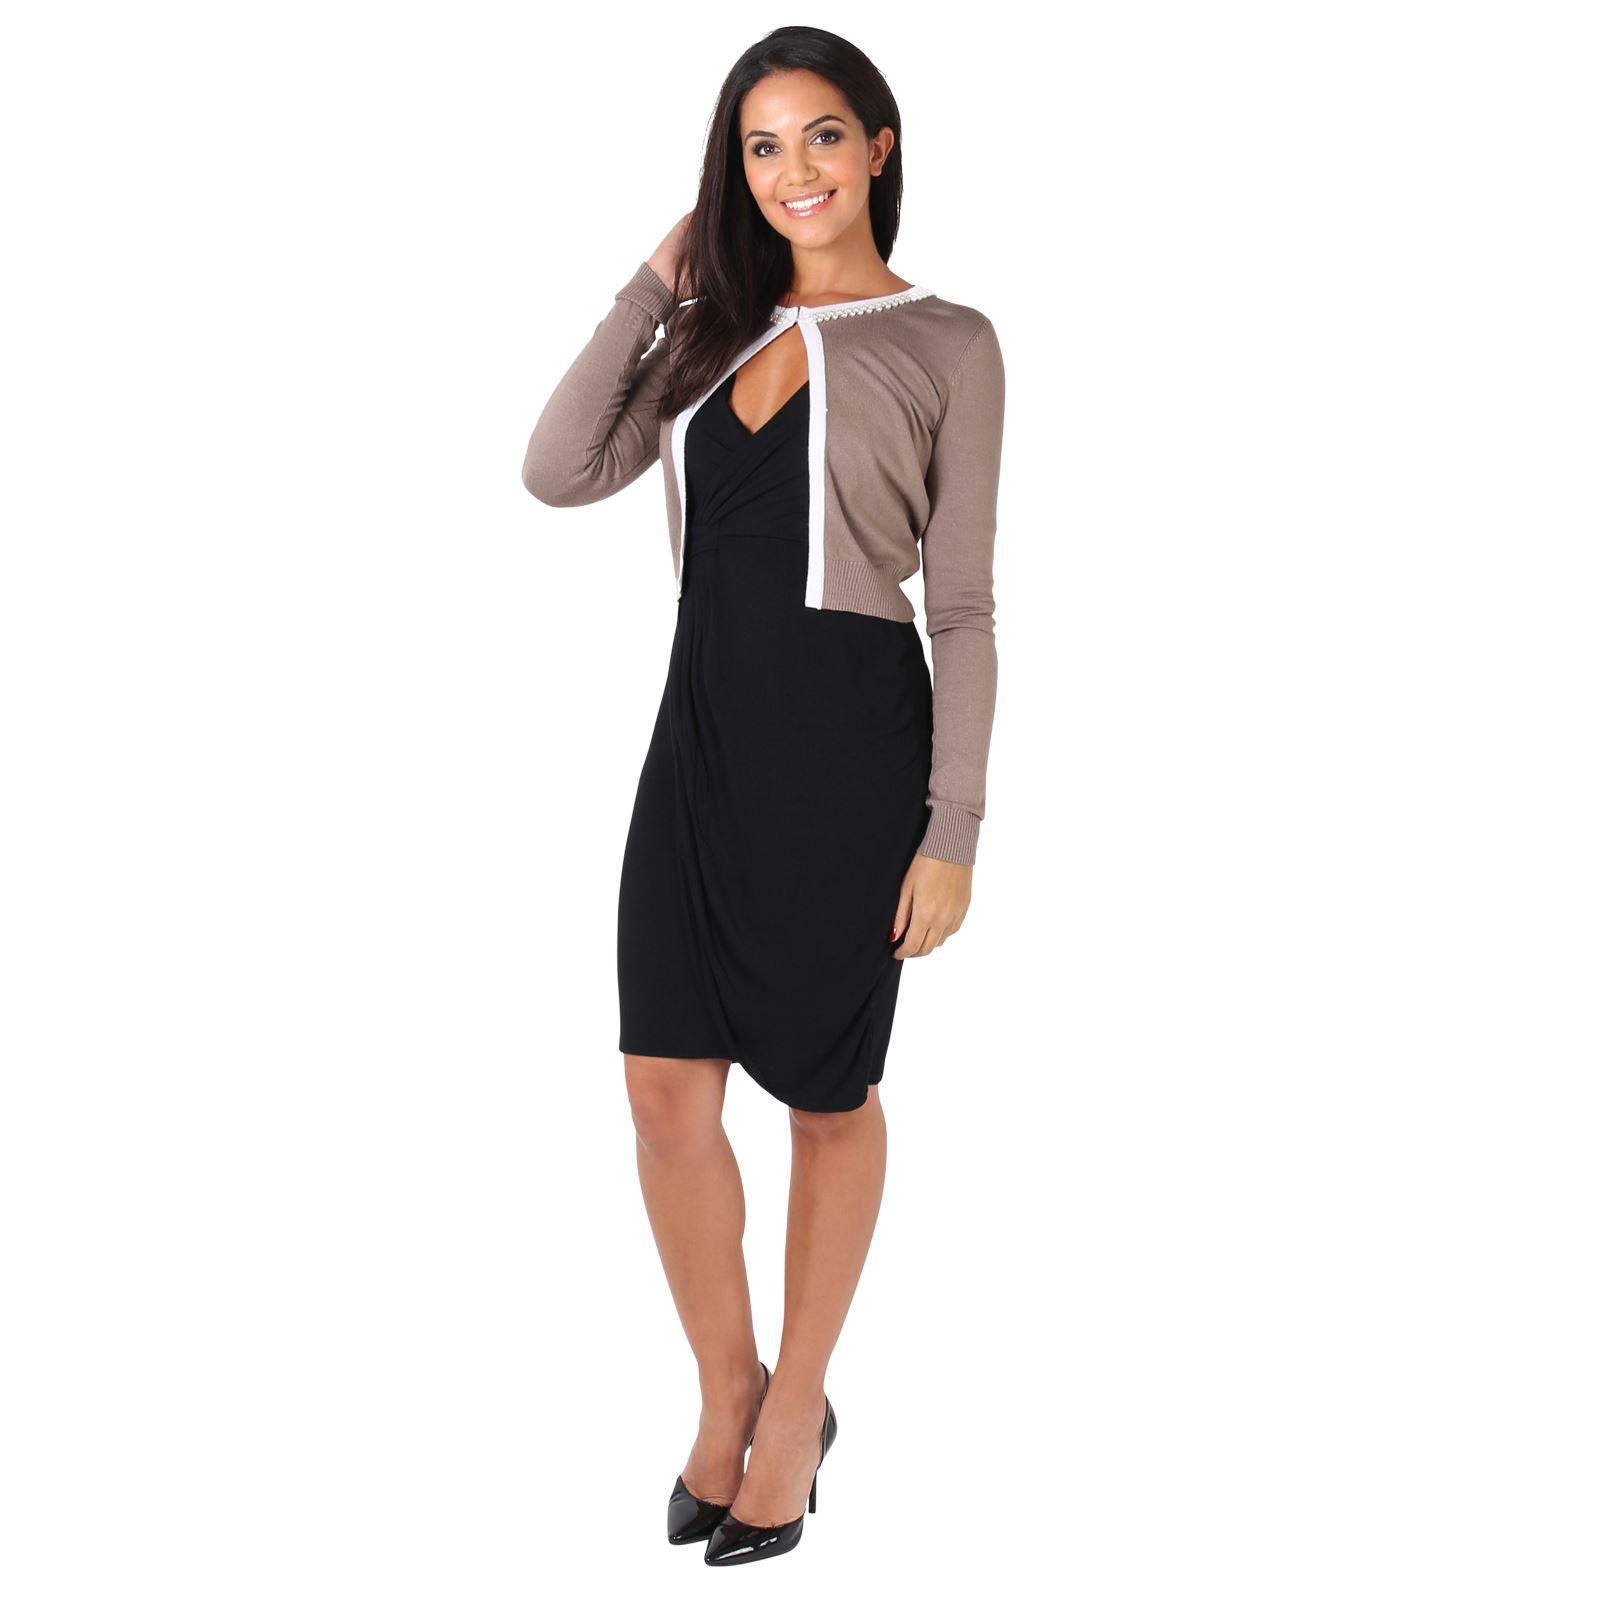 Femmes-Bolero-Jacket-Veste-Cardigan-Gilet-Chandail-Tricot-Perles-Manche-Longue